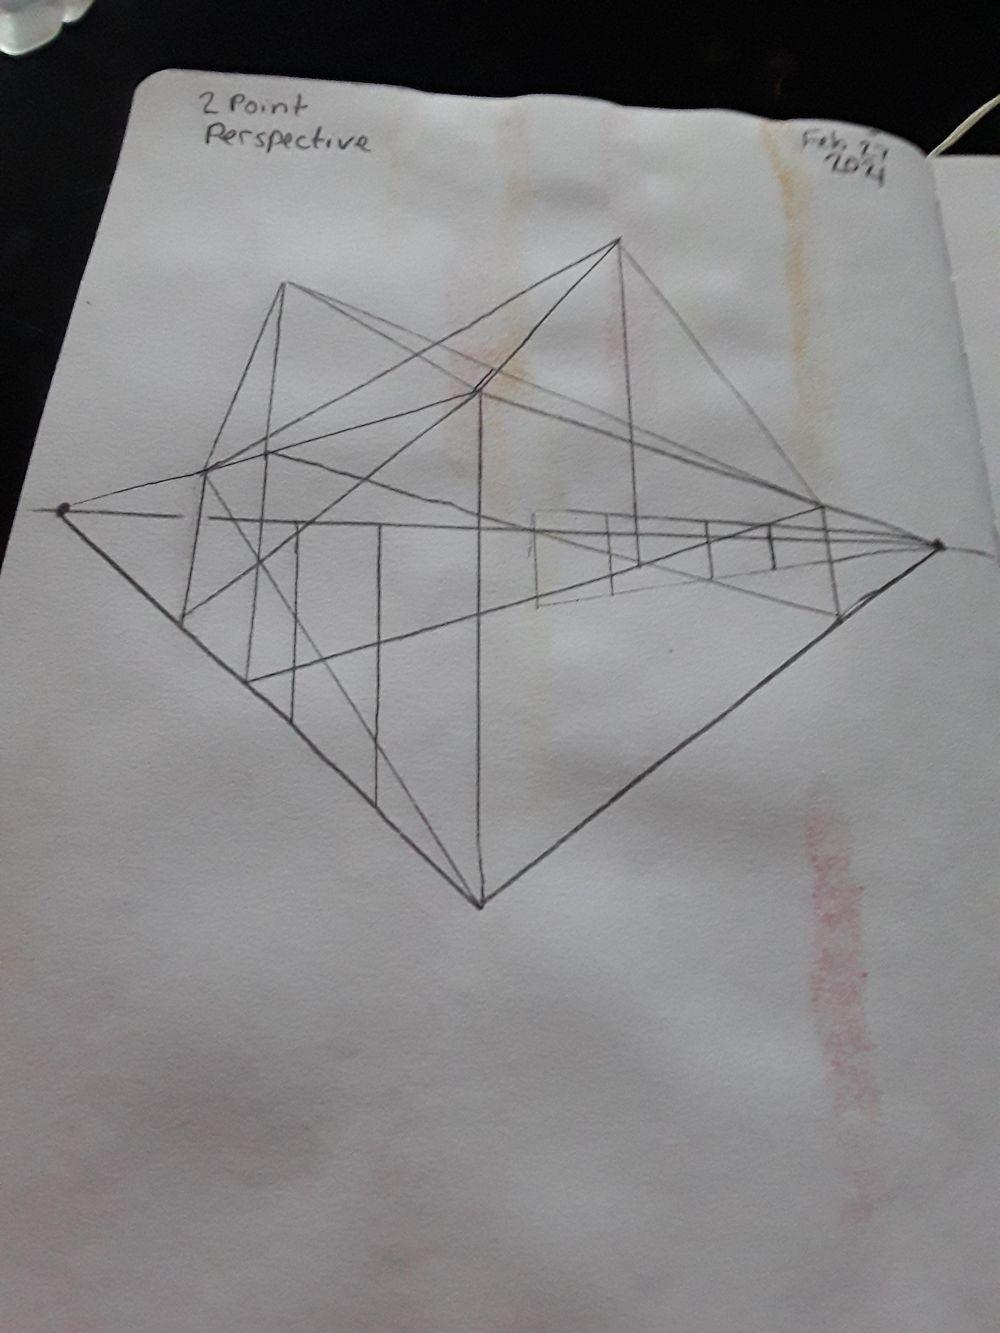 pencil drawing- basics - image 4 - student project